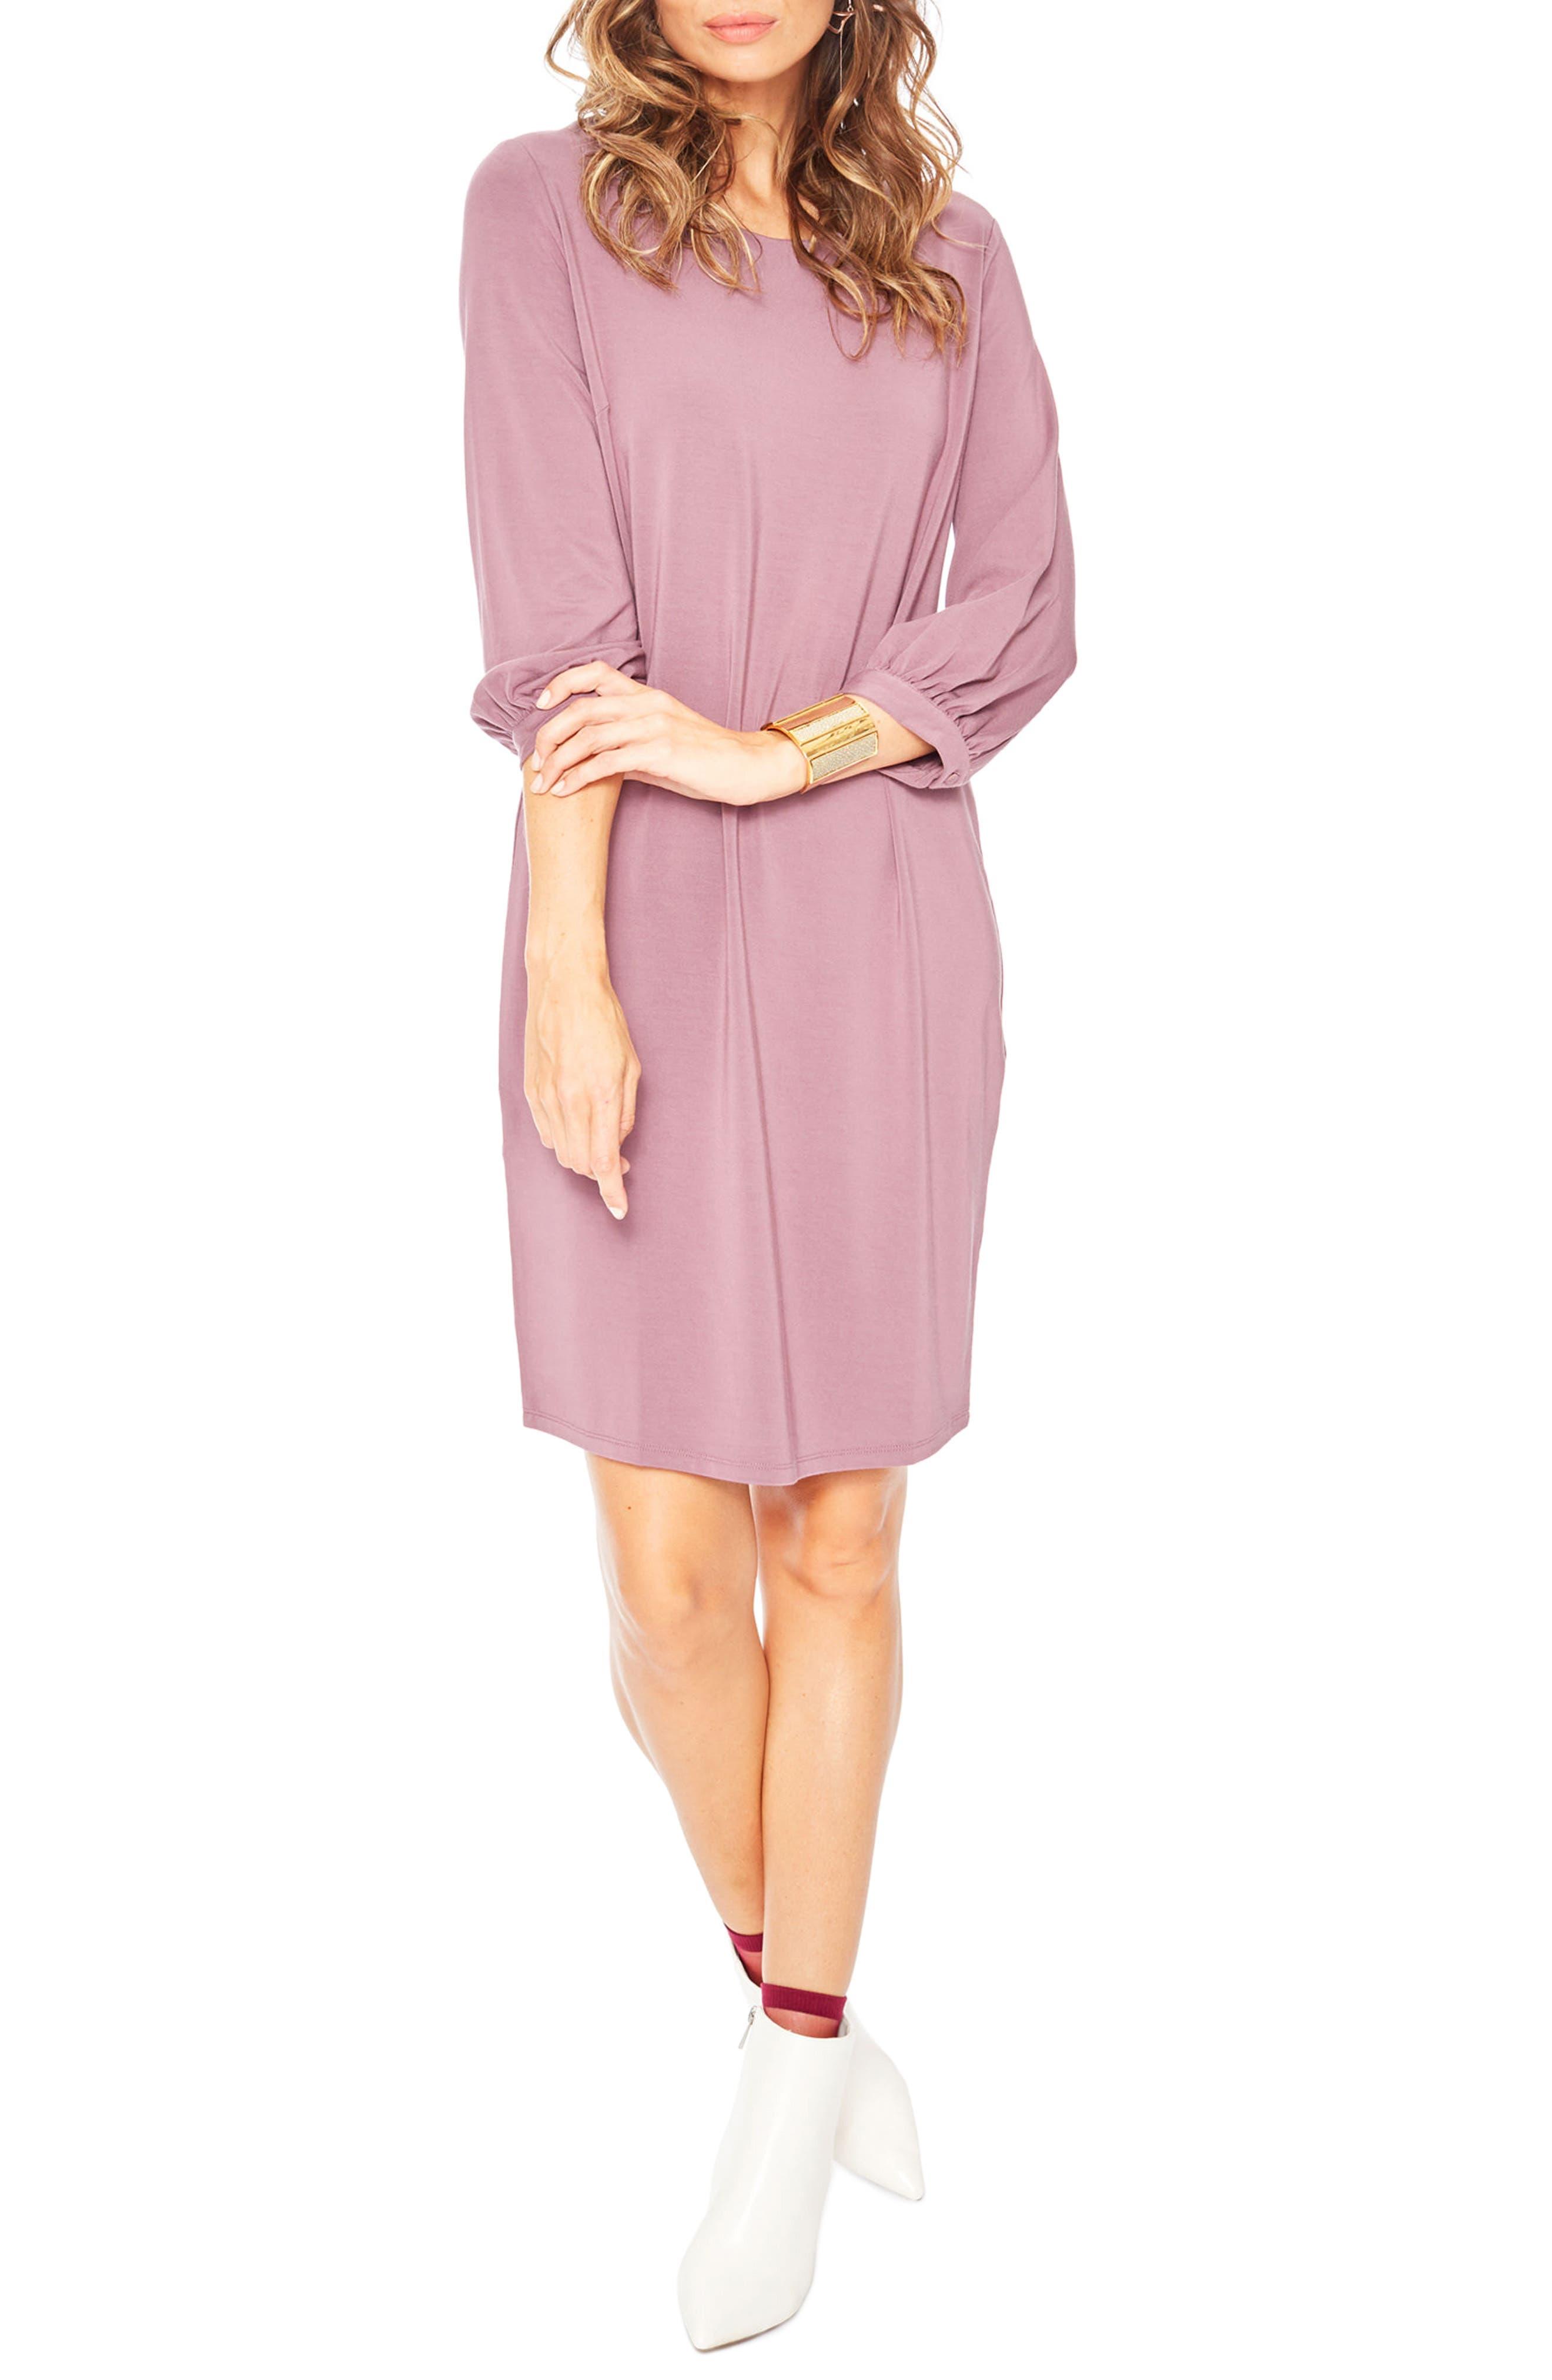 'Hampton' Maternity Dress,                             Main thumbnail 1, color,                             Stone Rose